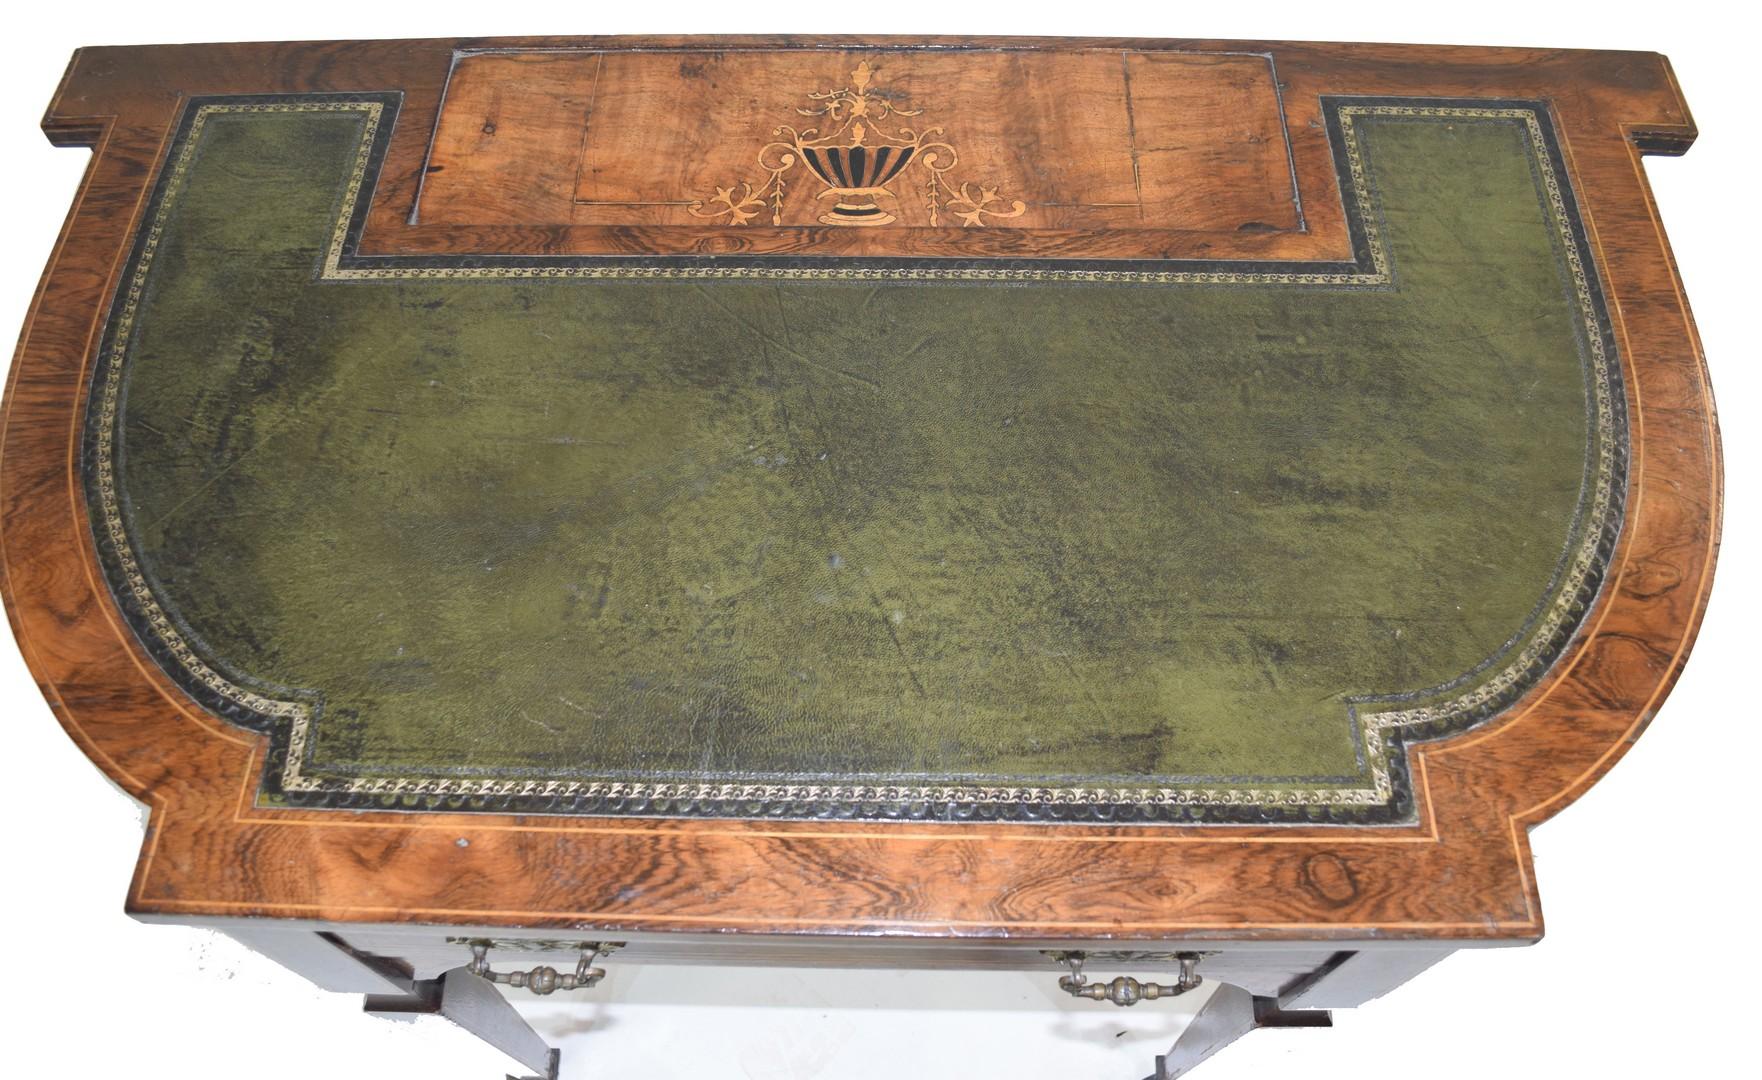 Late 19th century walnut veneered writing desk - Image 7 of 8